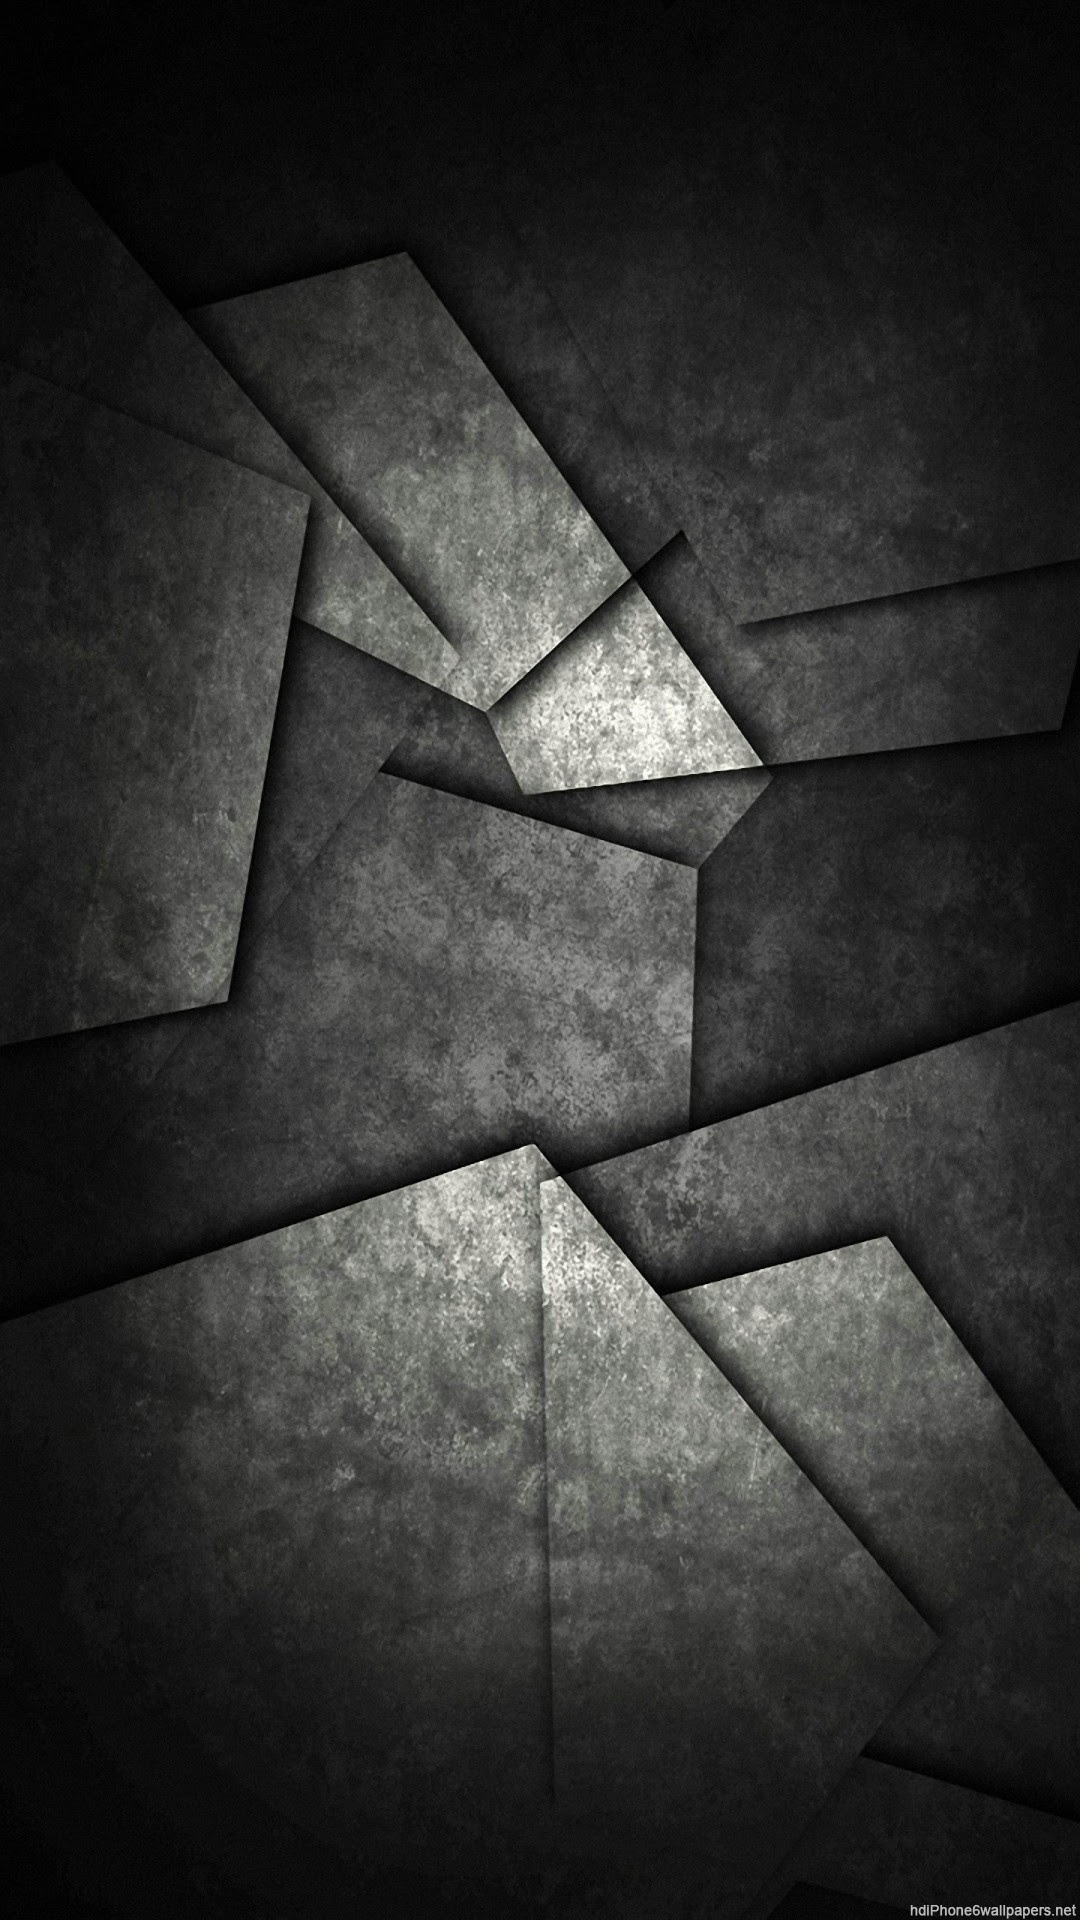 1080p Vertical Wallpaper (83+ images)